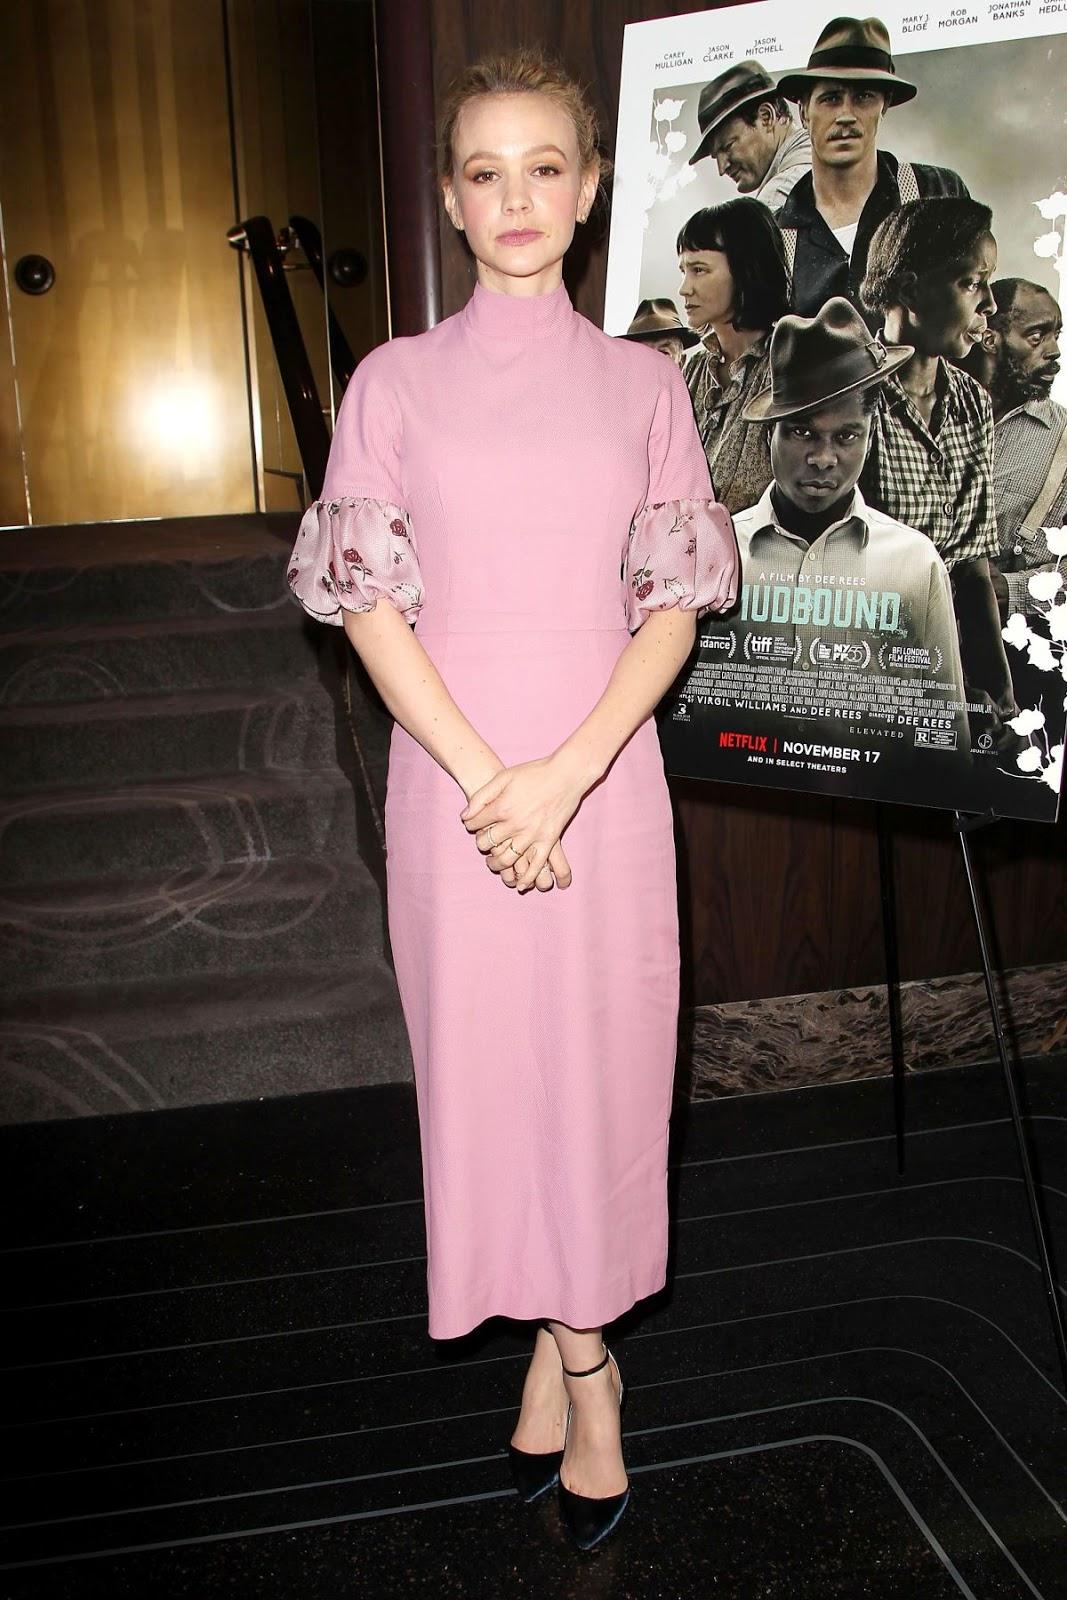 Photos of Carey Mulligan at Mudbound Special Screening and Reception in New York